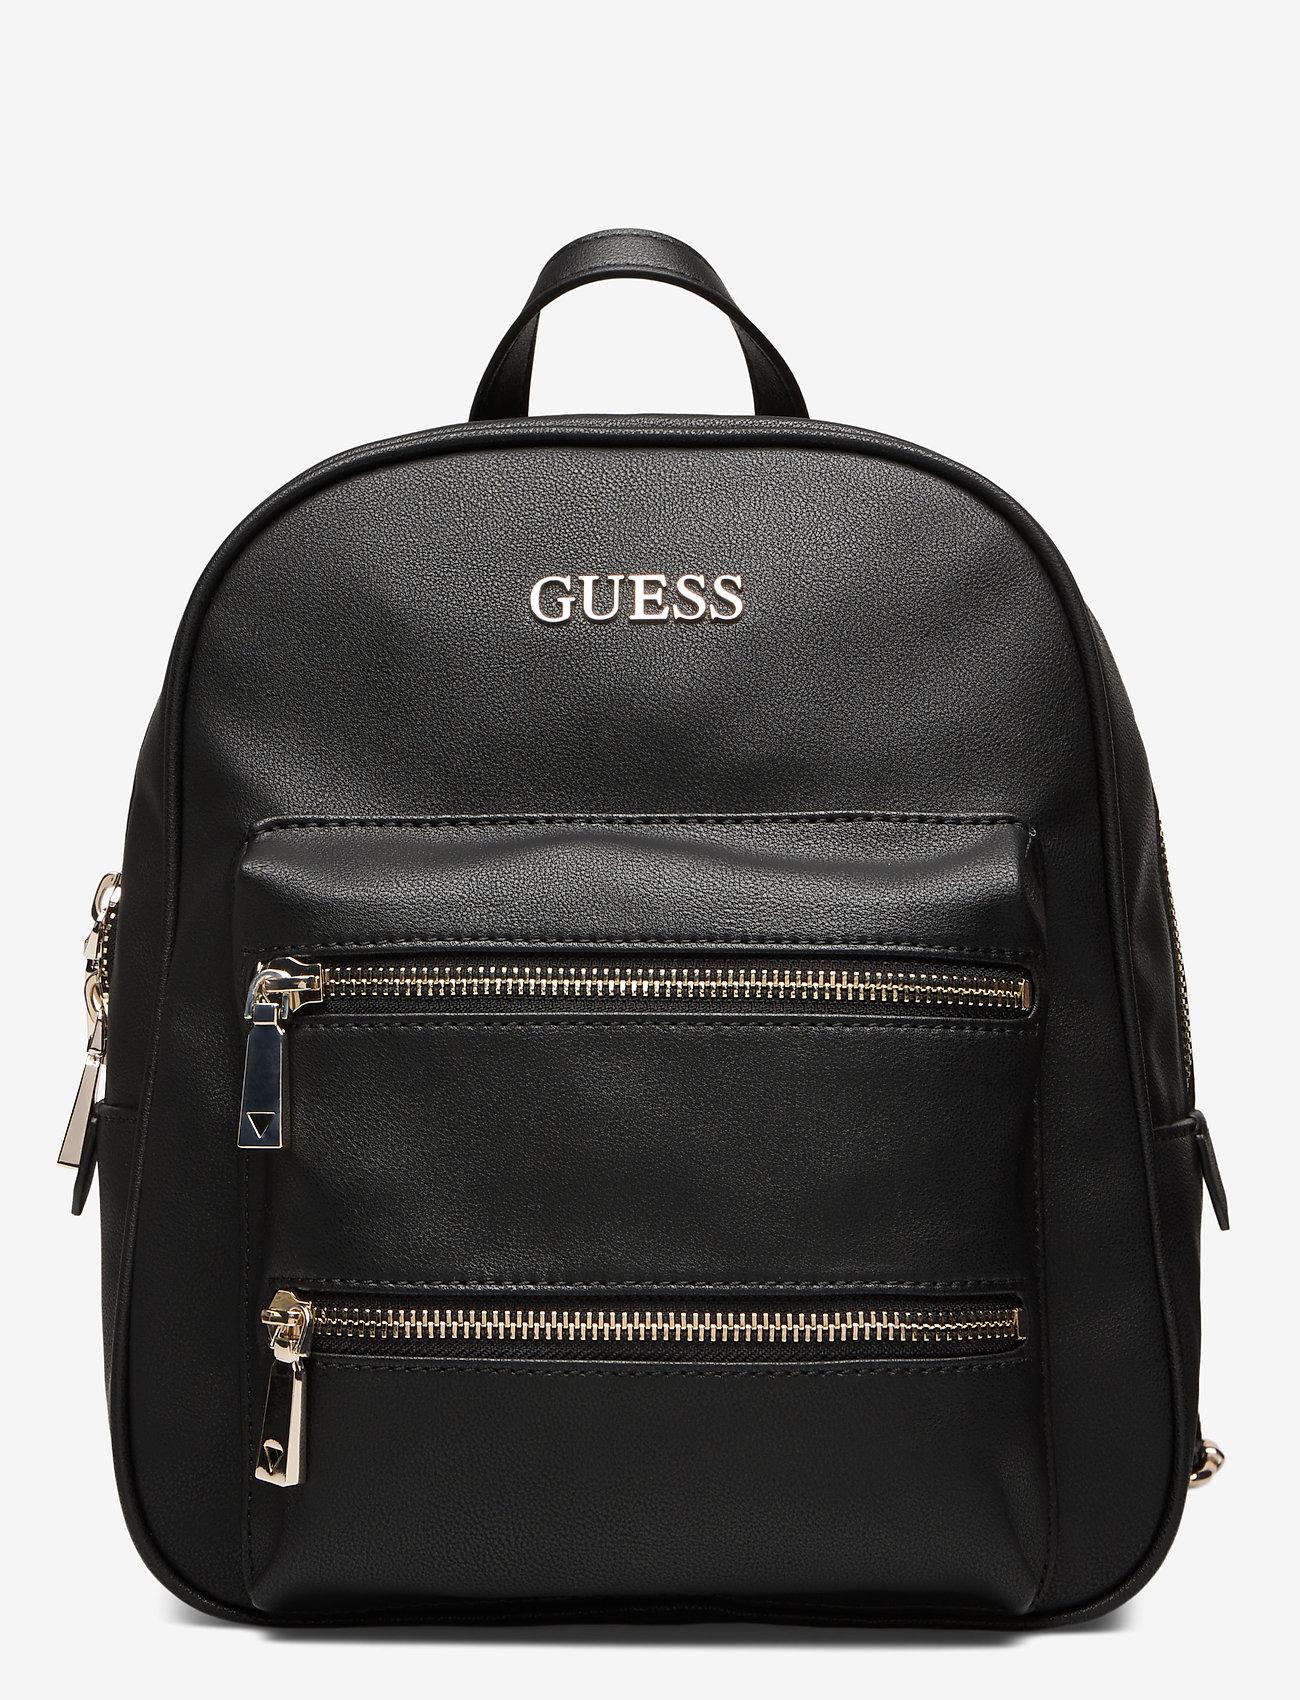 Guess Caley Large Backpack - Sac Á Dos Black